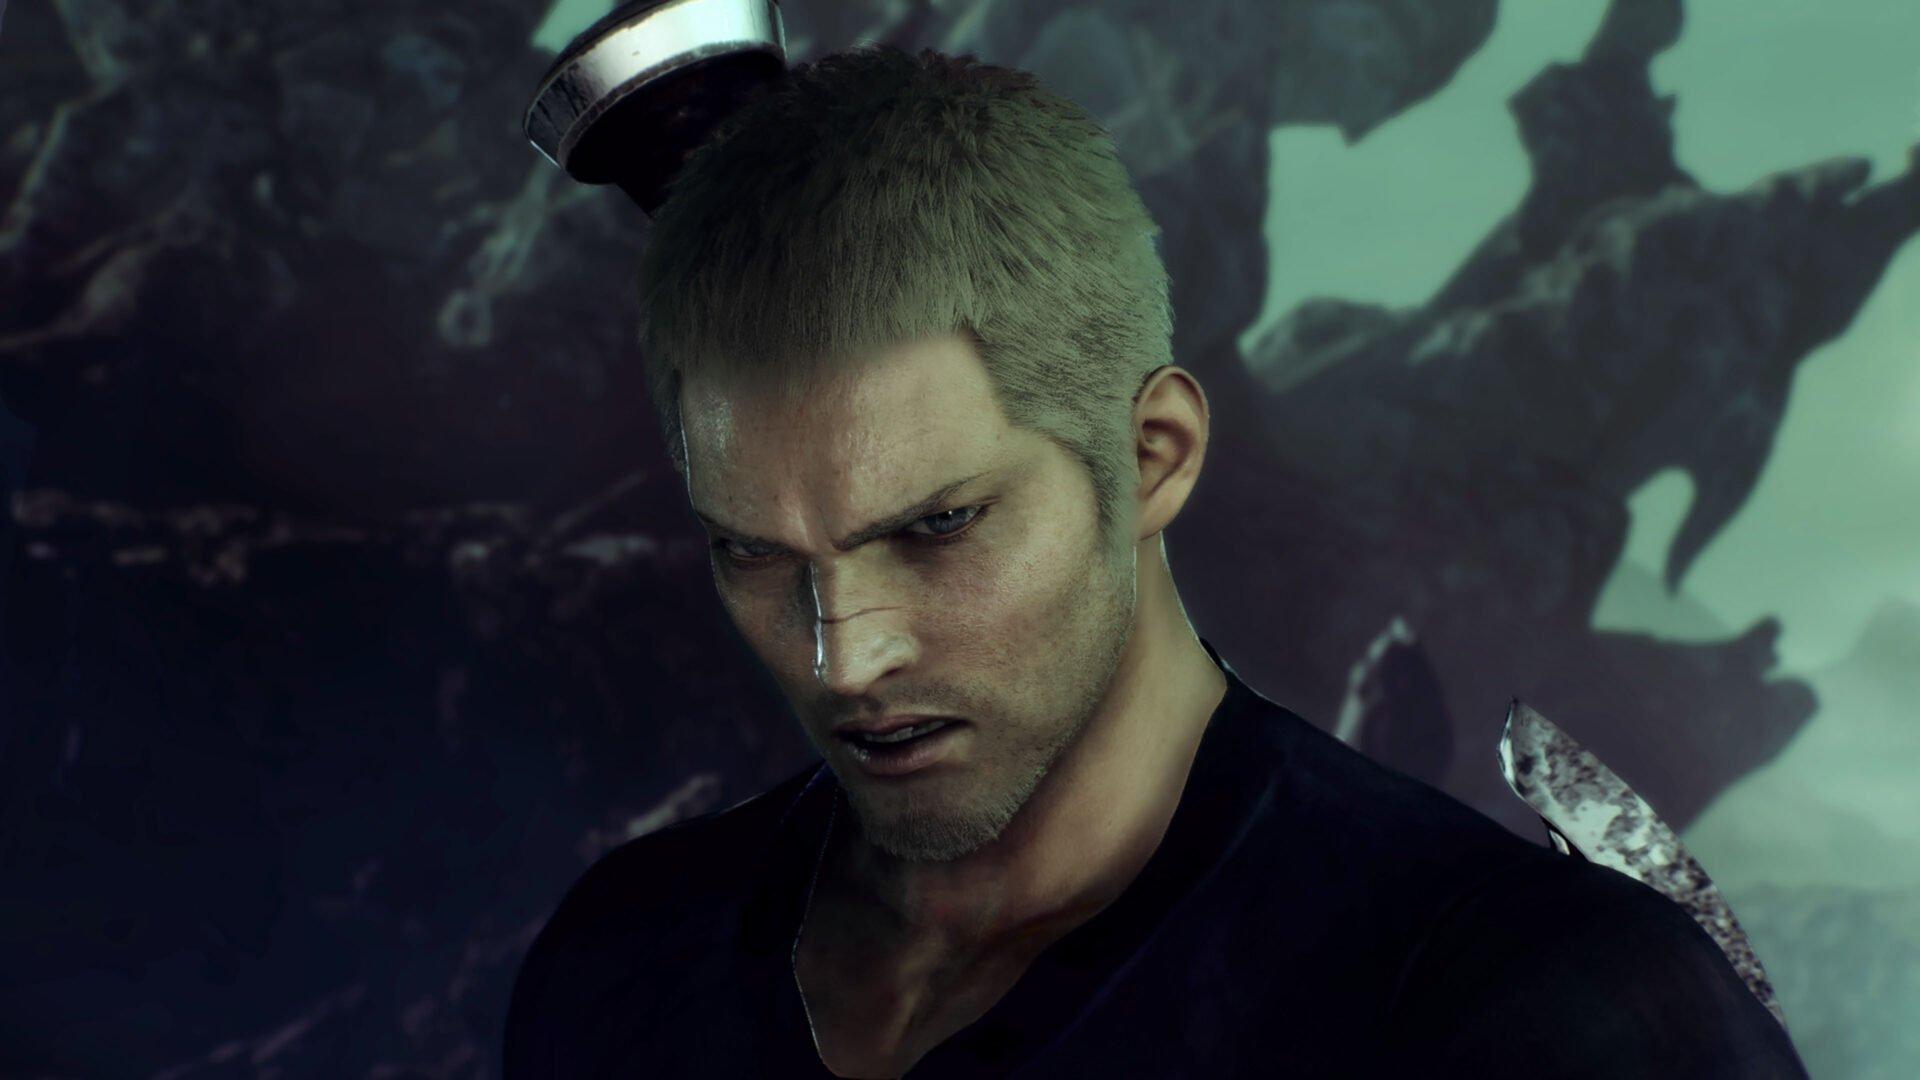 Final Fantasy Origin: Stranger of Paradise